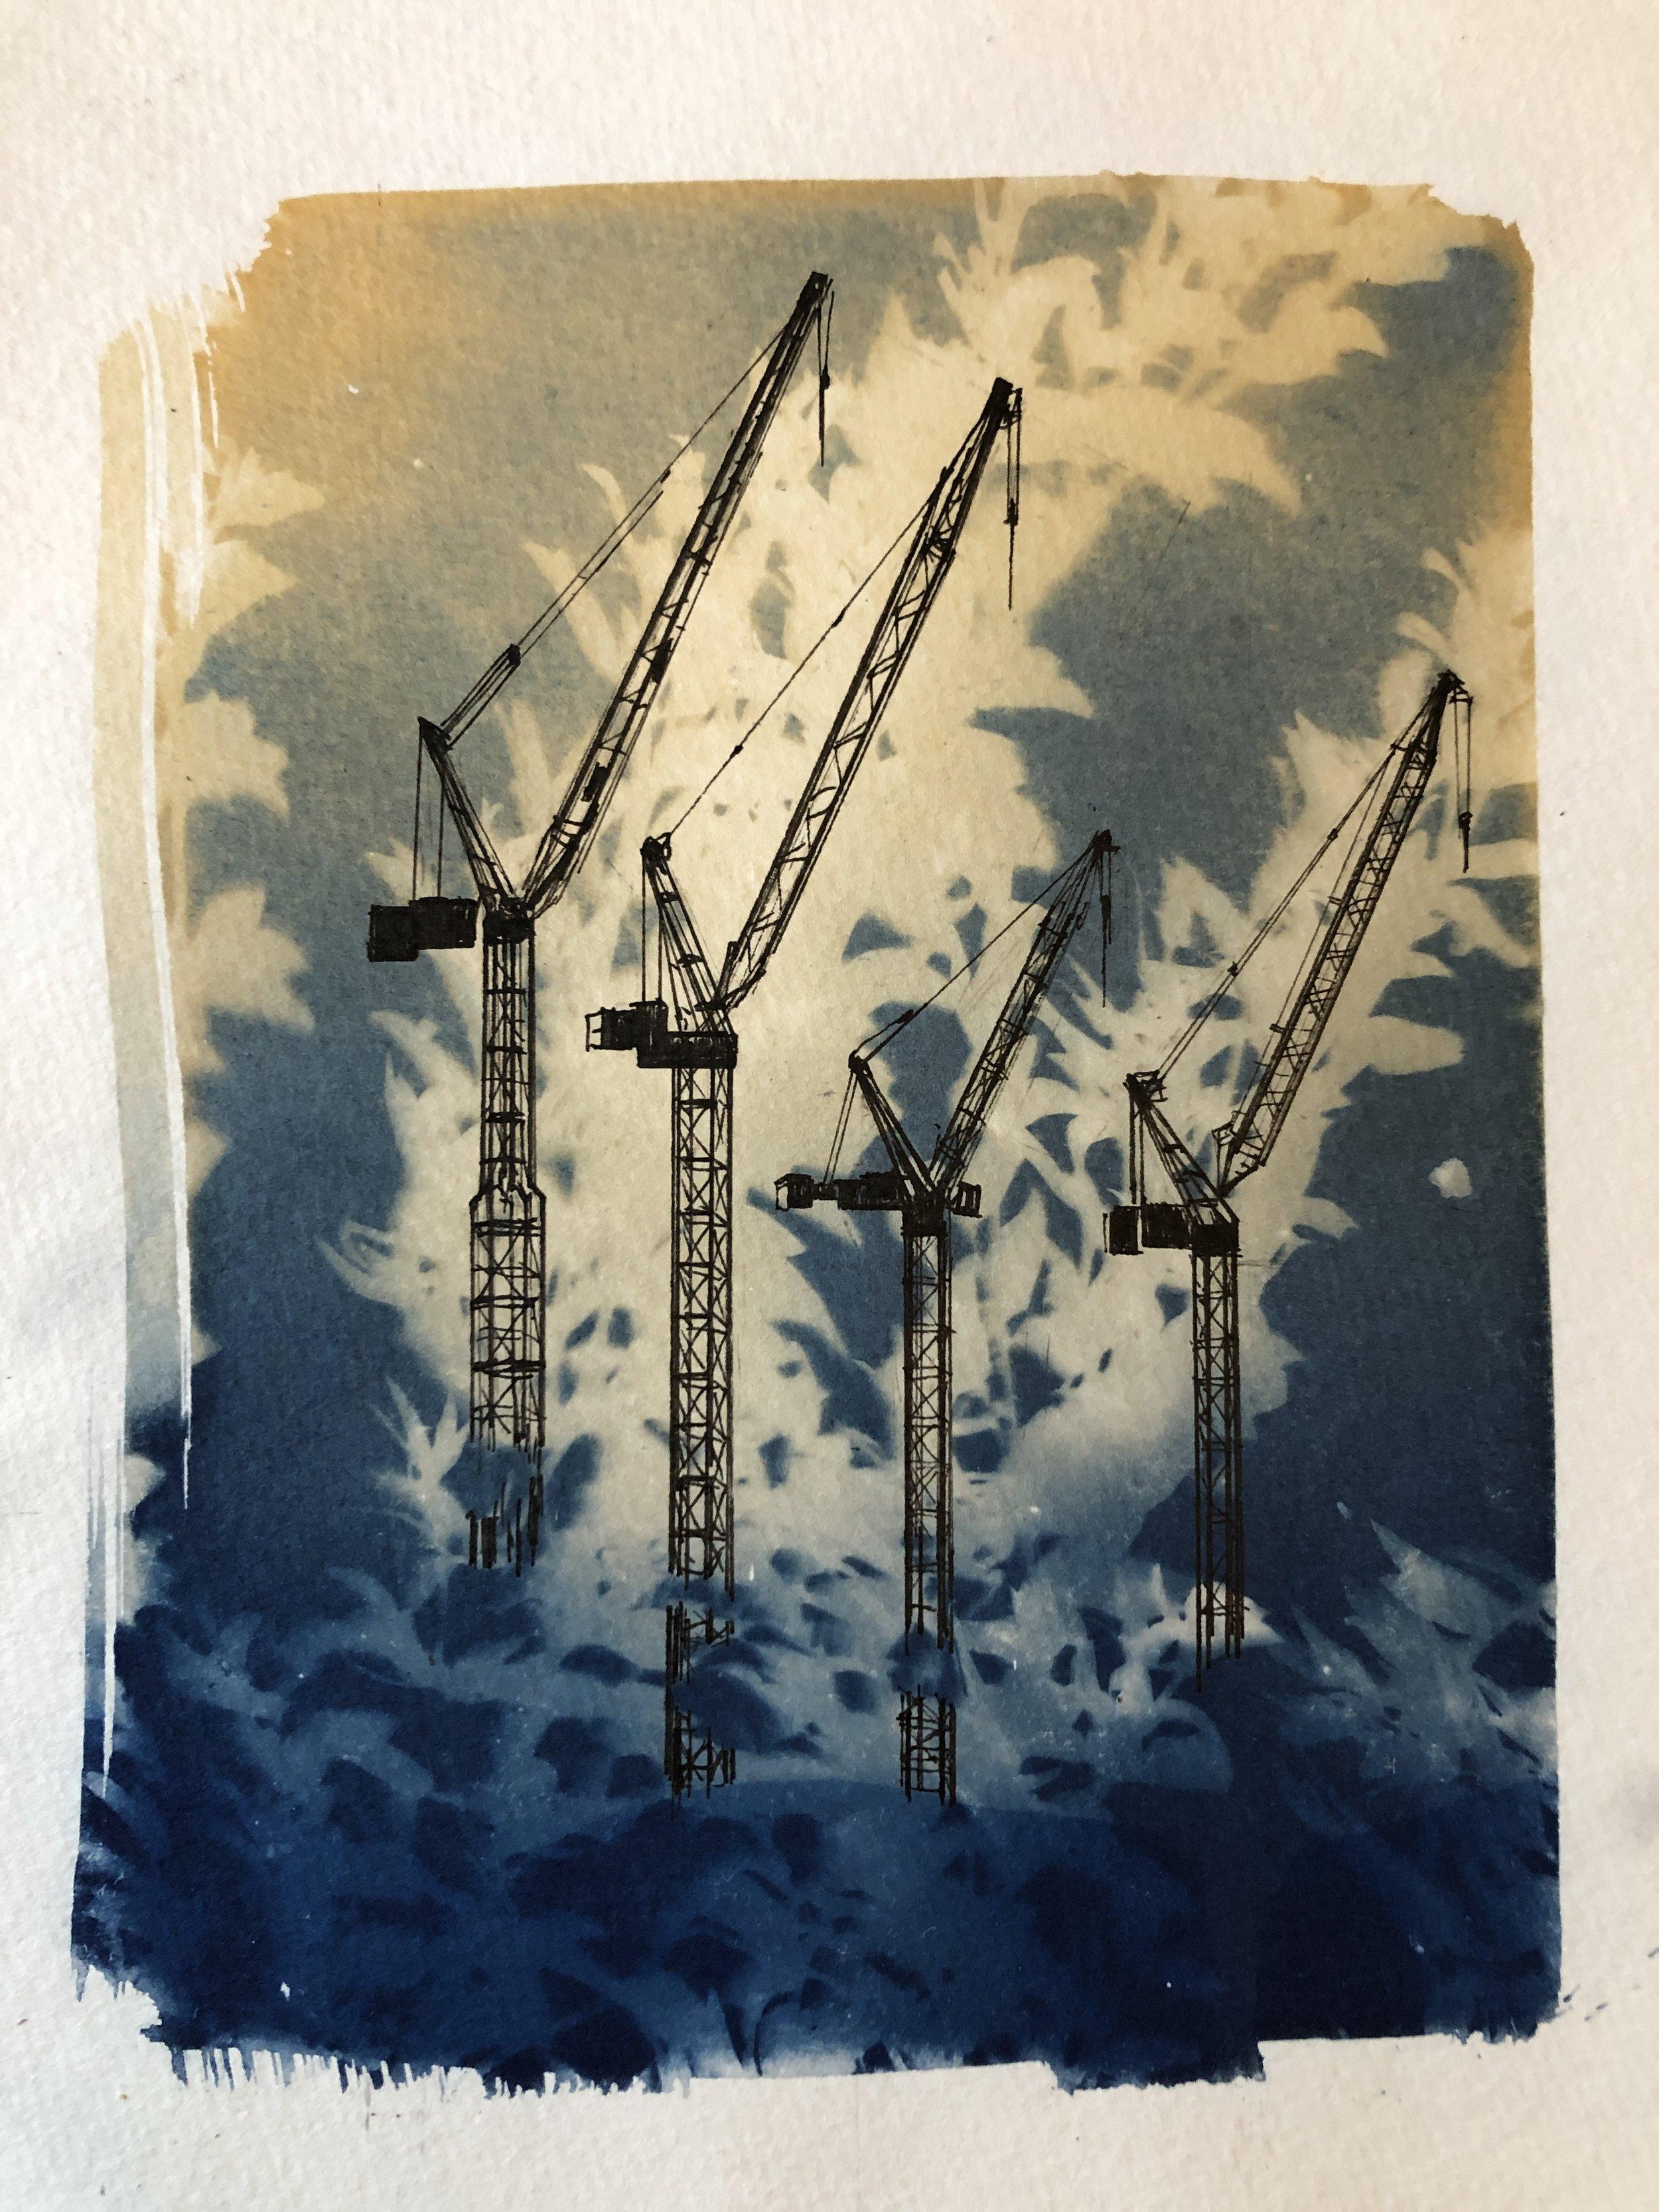 Craig_Entanglement 10 (cranes).jpg